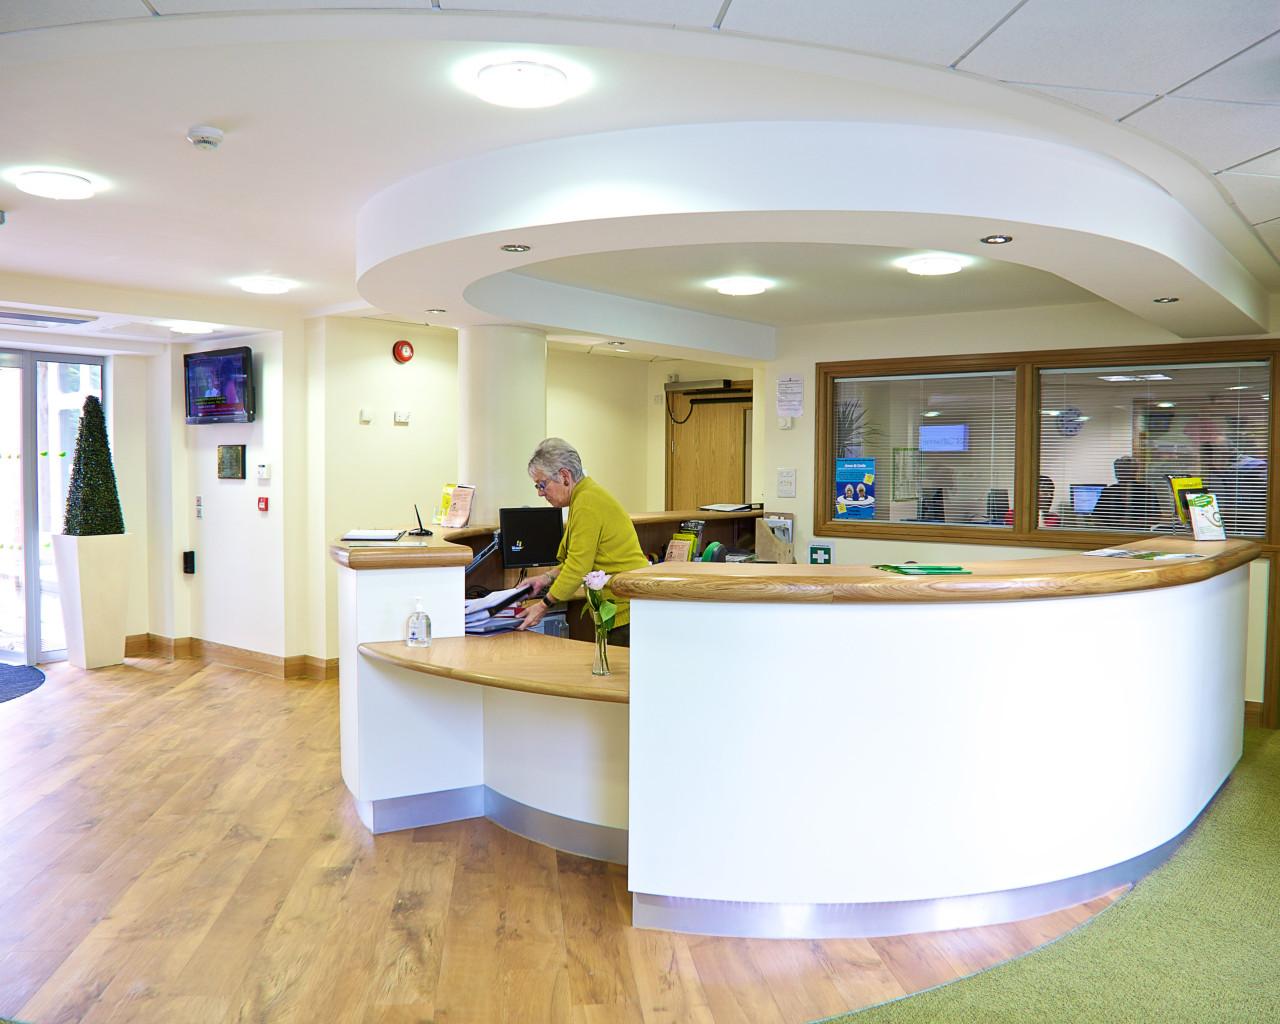 Commercial interior design services, Bolton, Manchester, Lancashire, Cheshire, Liverpool, Birmingham, Leeds, UK